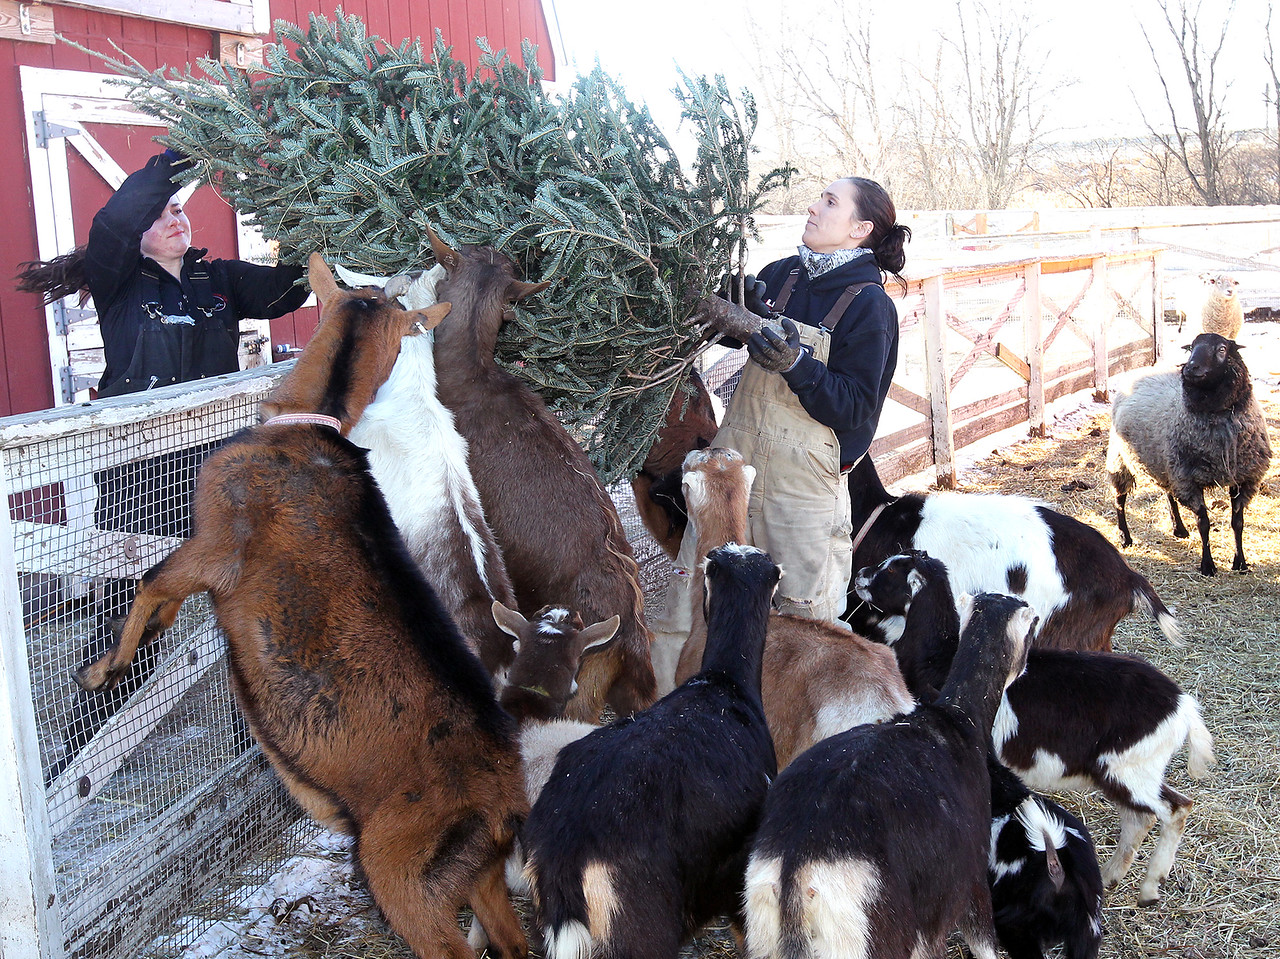 LCJ_111_Lambs_Christmas_Trees_C